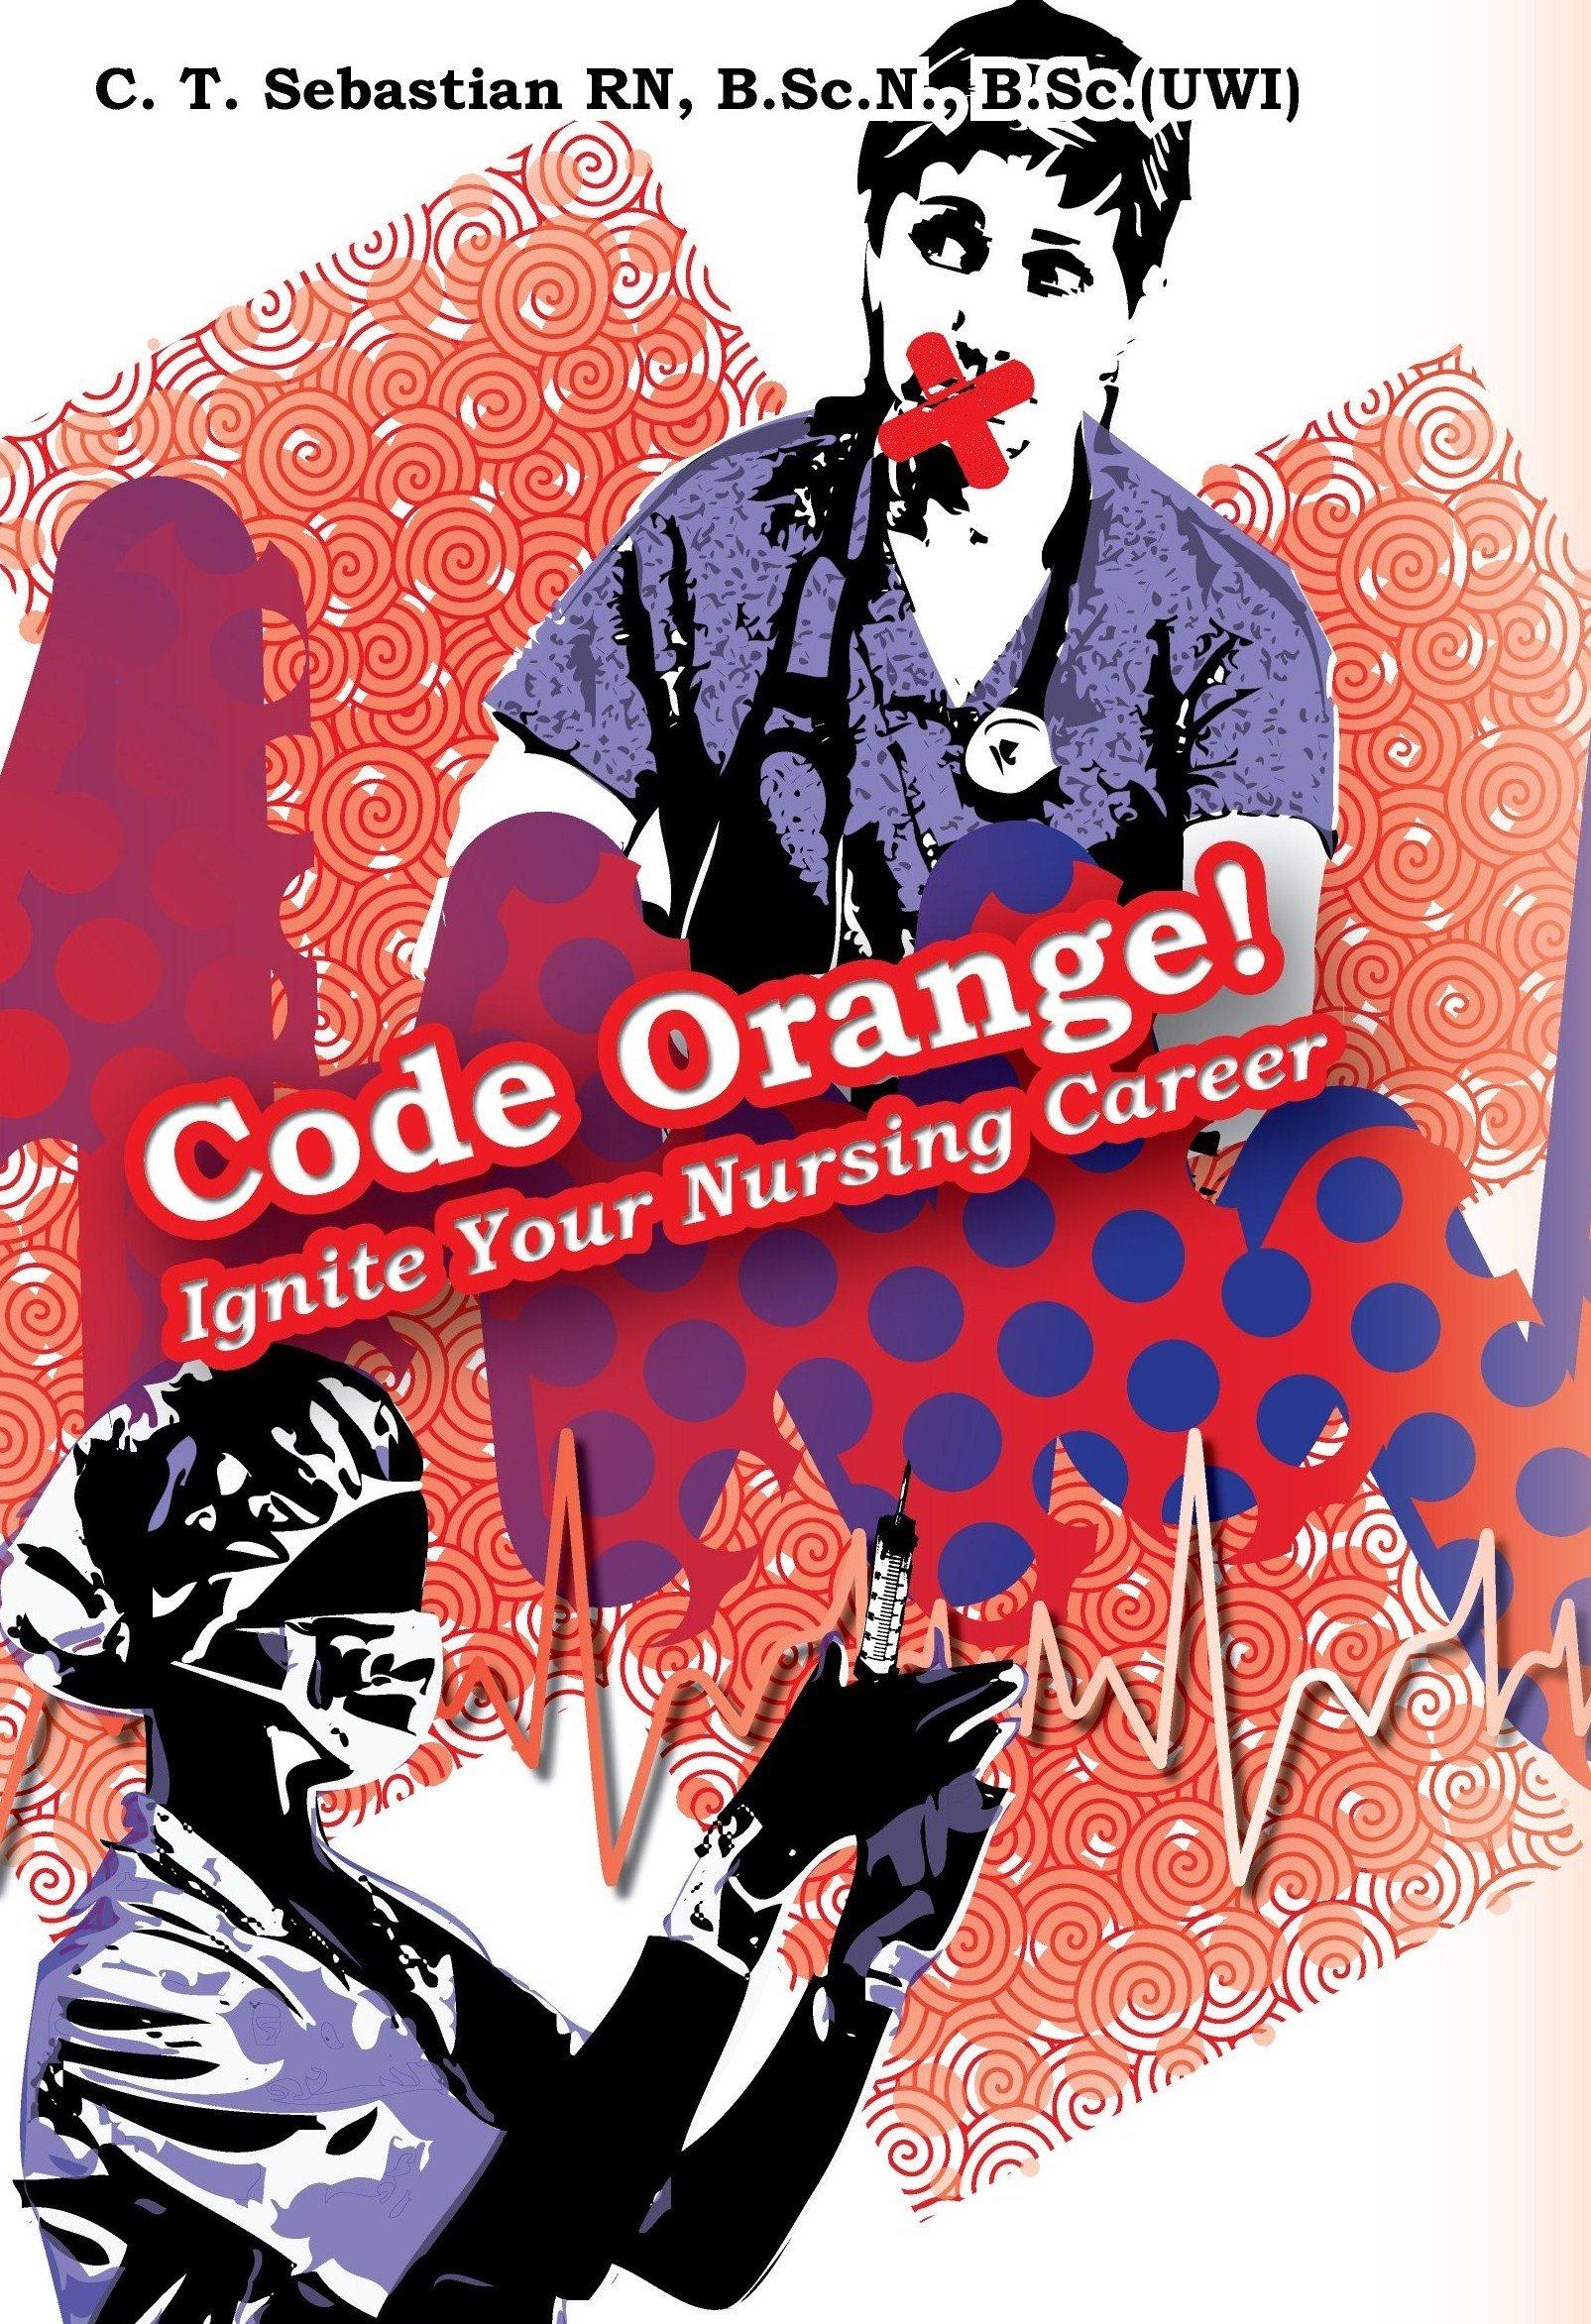 Download Code Orange! Ignite Your Nursing Career Text fb2 book